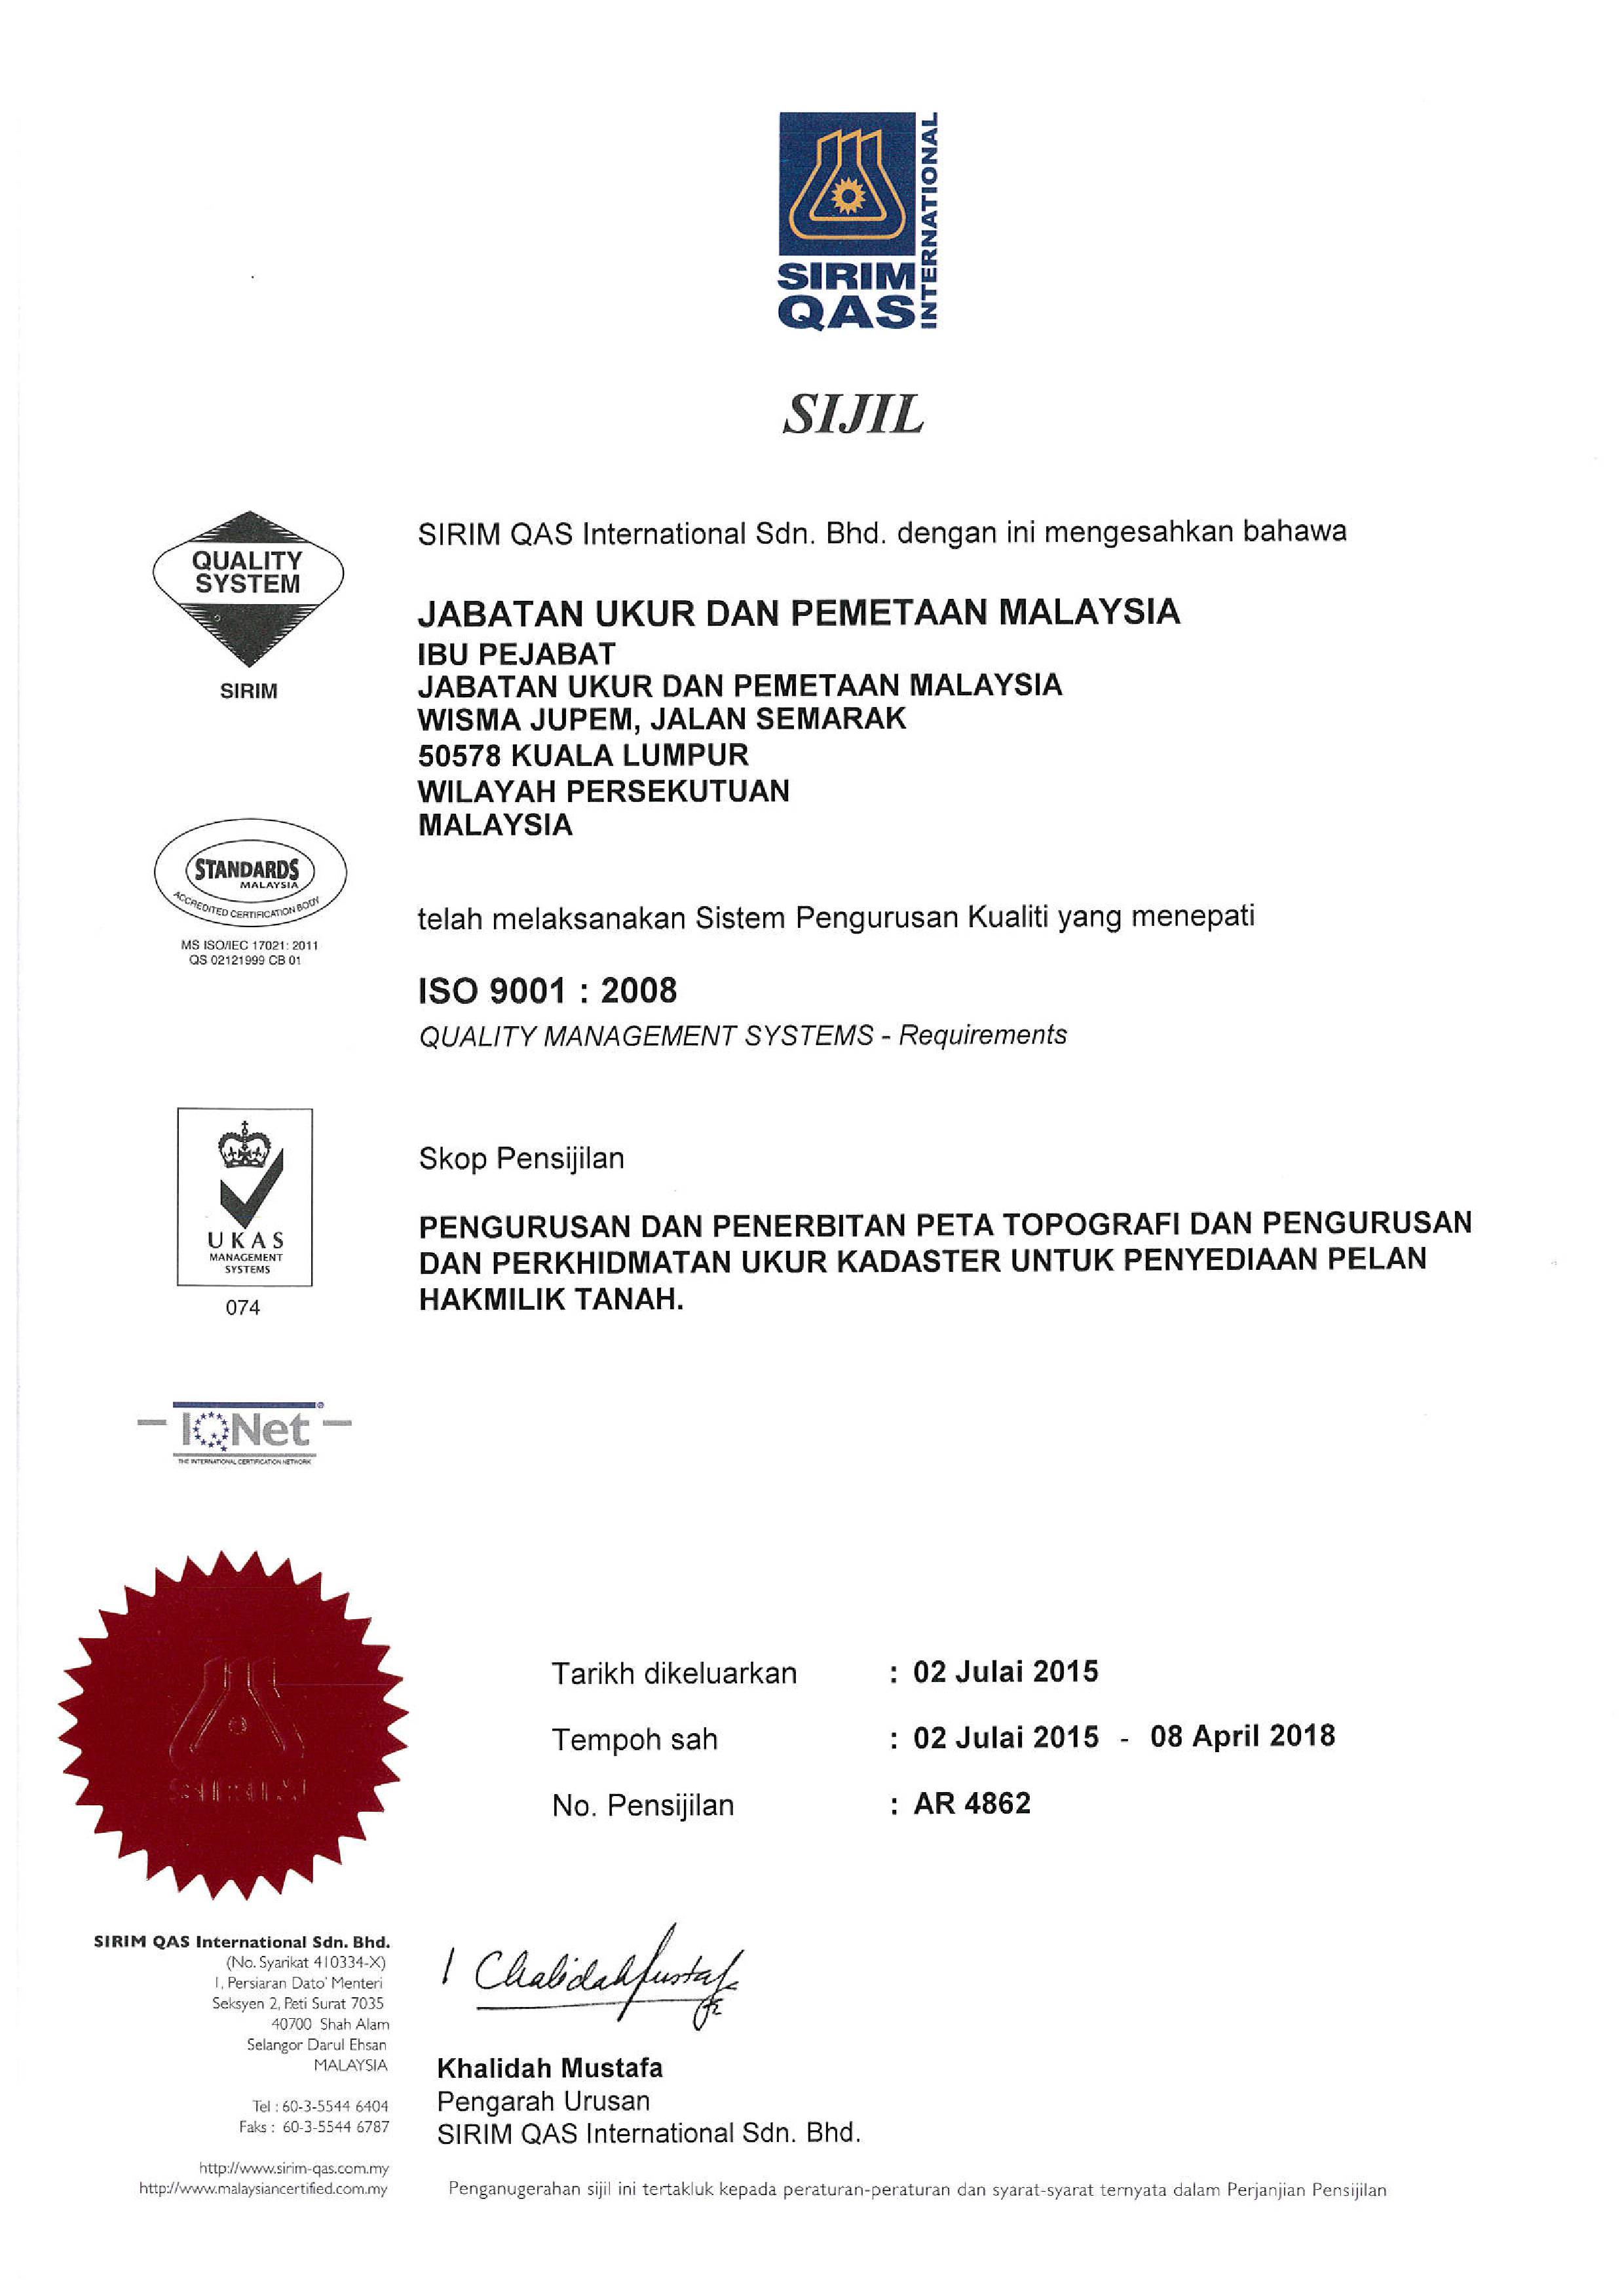 ms iso 9001 version 2008 pdf